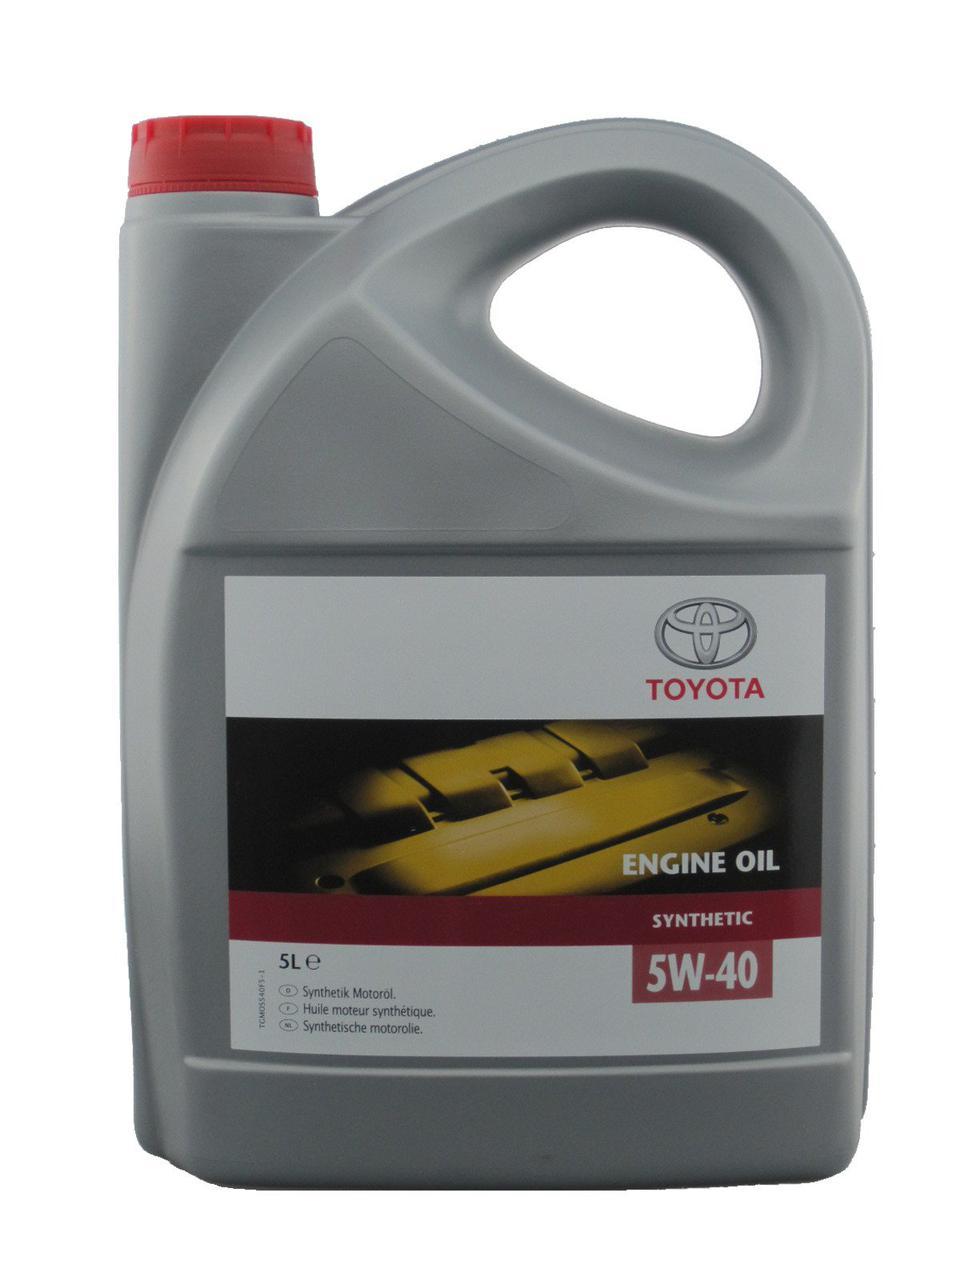 Toyota Engine Oil 5W-40 5л